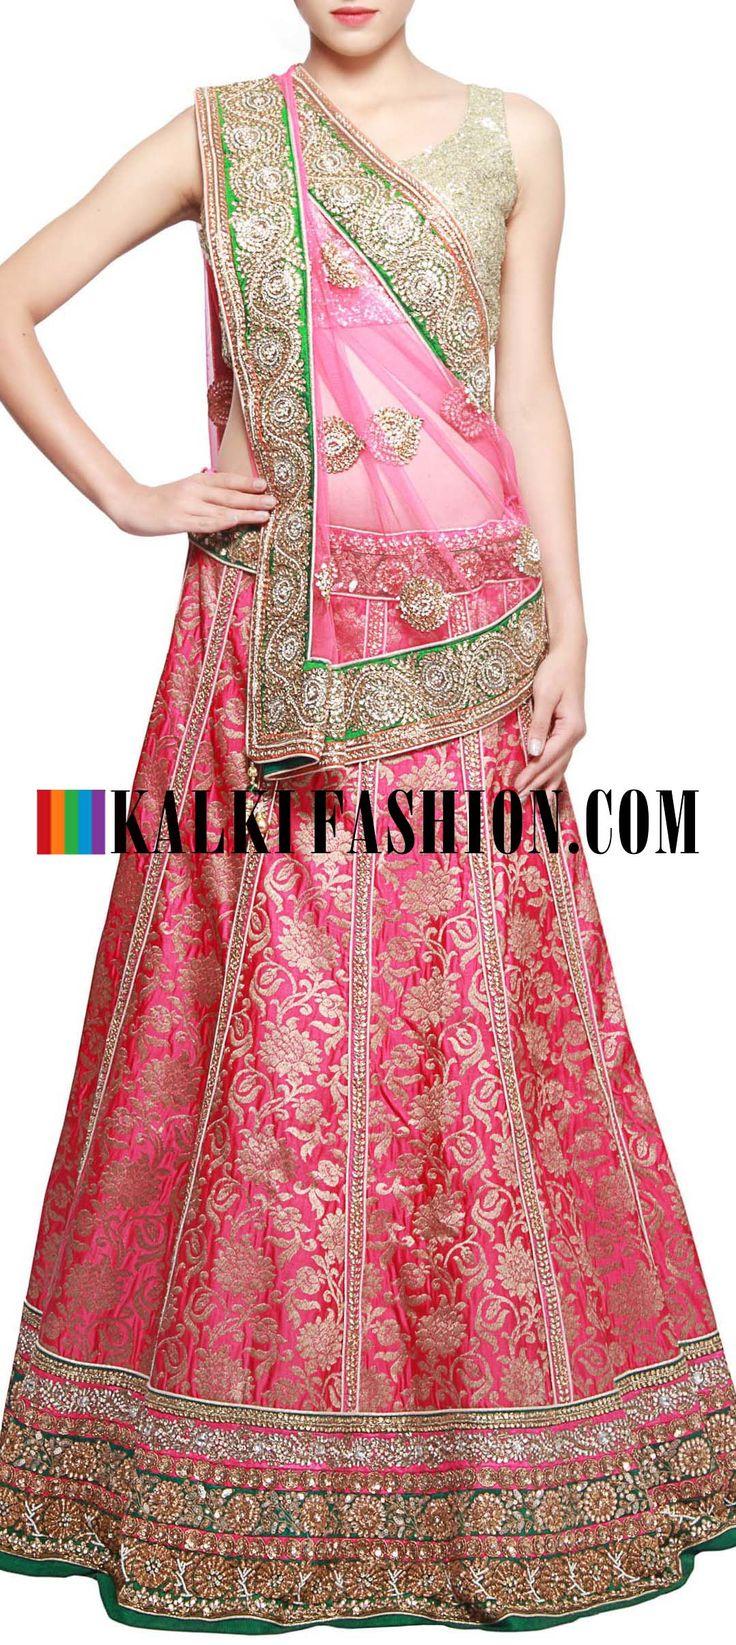 Get this beautiful lehenga here: http://www.kalkifashion.com/pink-brocade-lehenga-adorn-in-kundan-embroidery-only-on-kalki.html Free shipping worldwide.